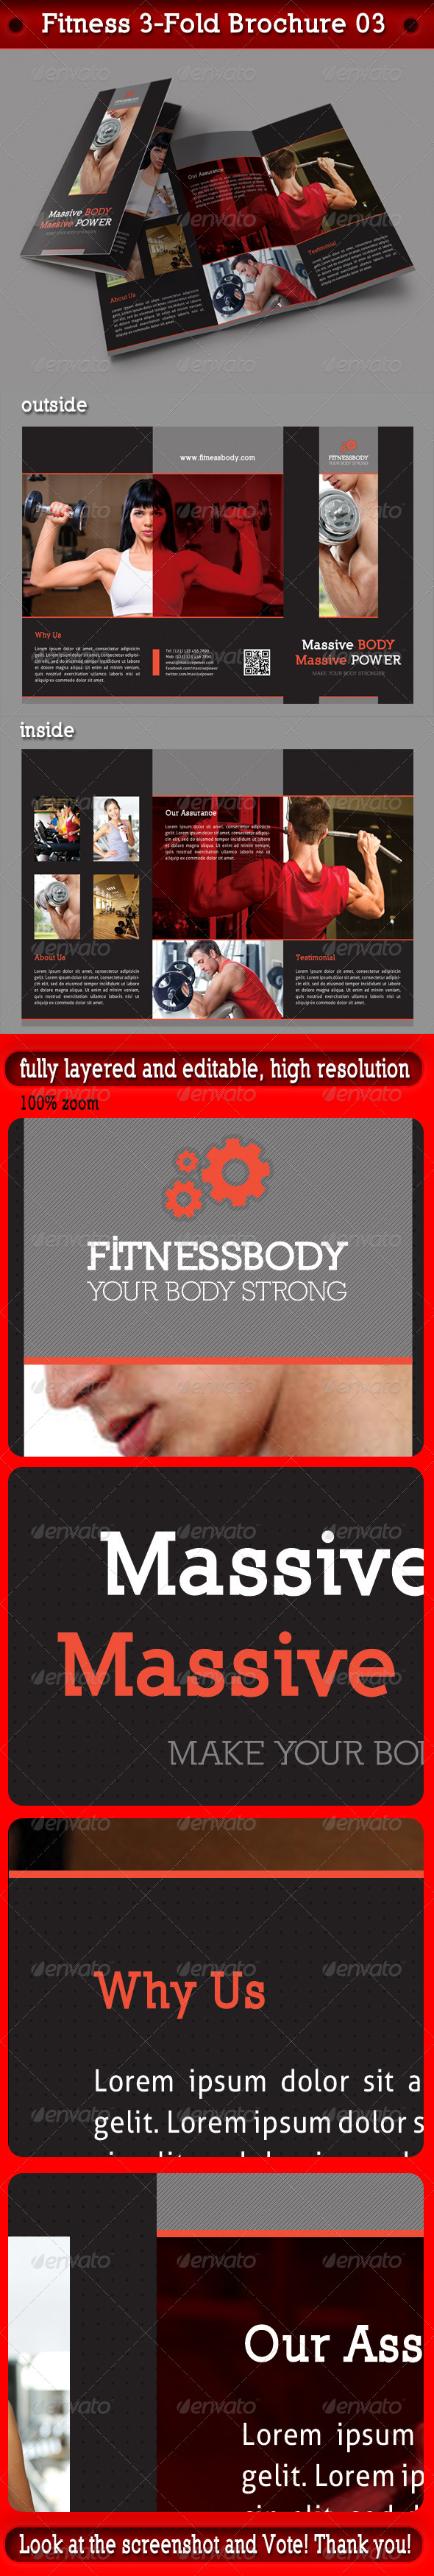 GraphicRiver Fitness 3-Fold Brochure 03 5218372